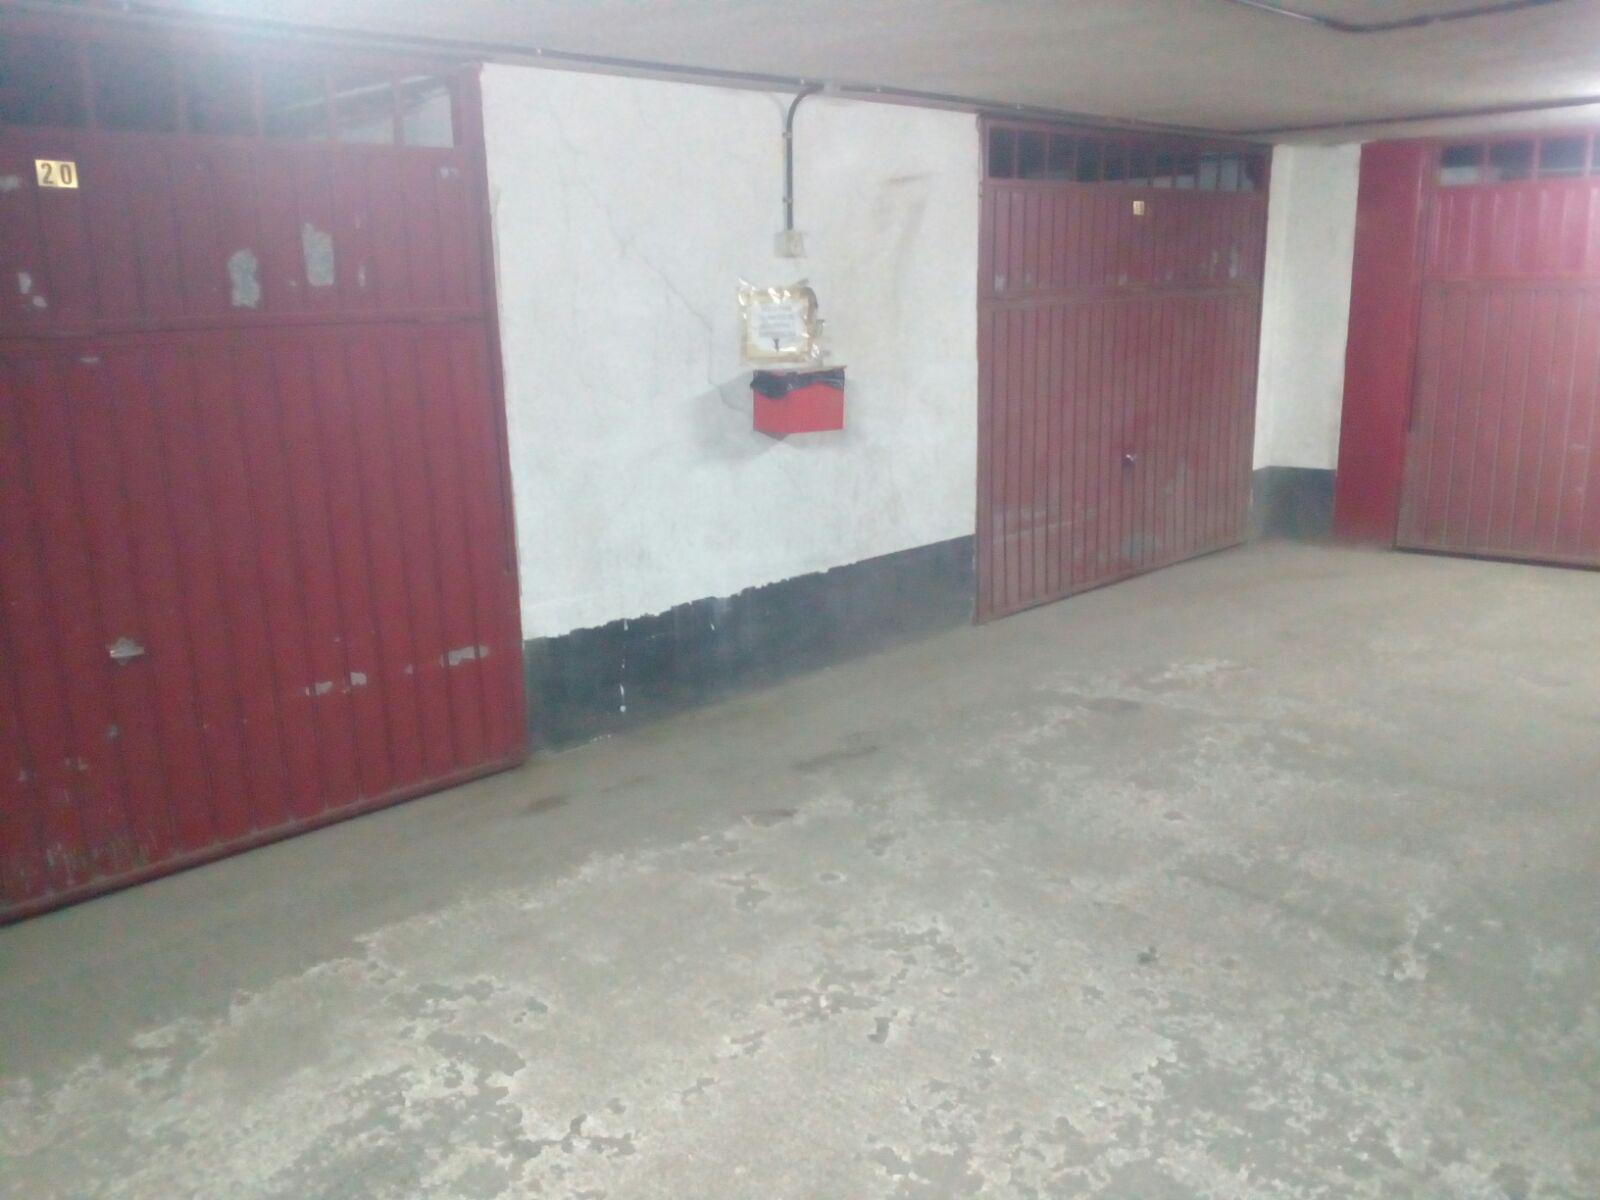 169790 - Zona   centro